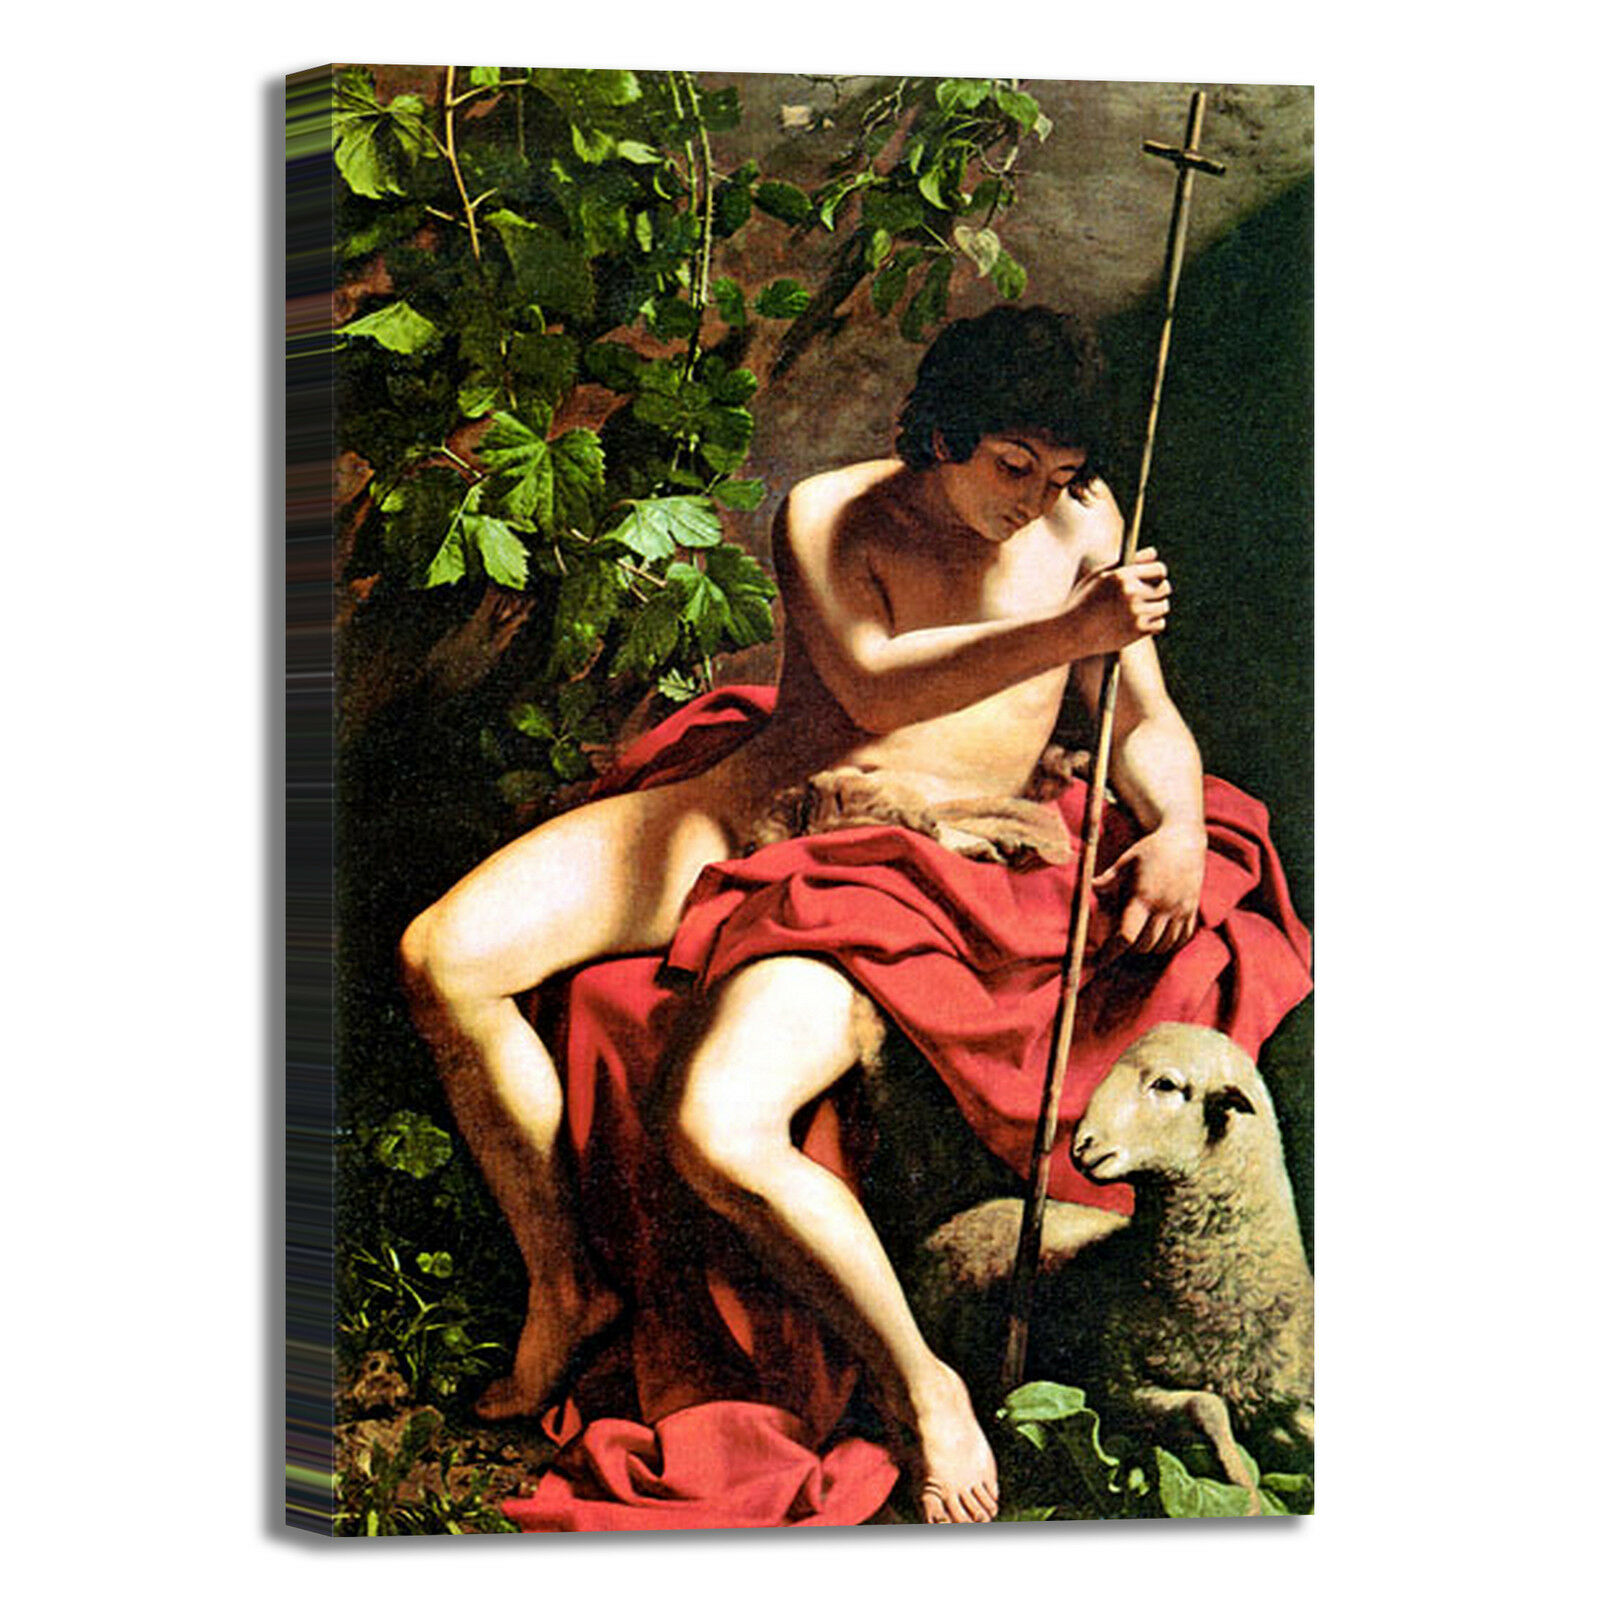 Caravaggio san Battista Giovanni Battista san quadro stampa tela dipinto telaio arRouge o casa 52dec4